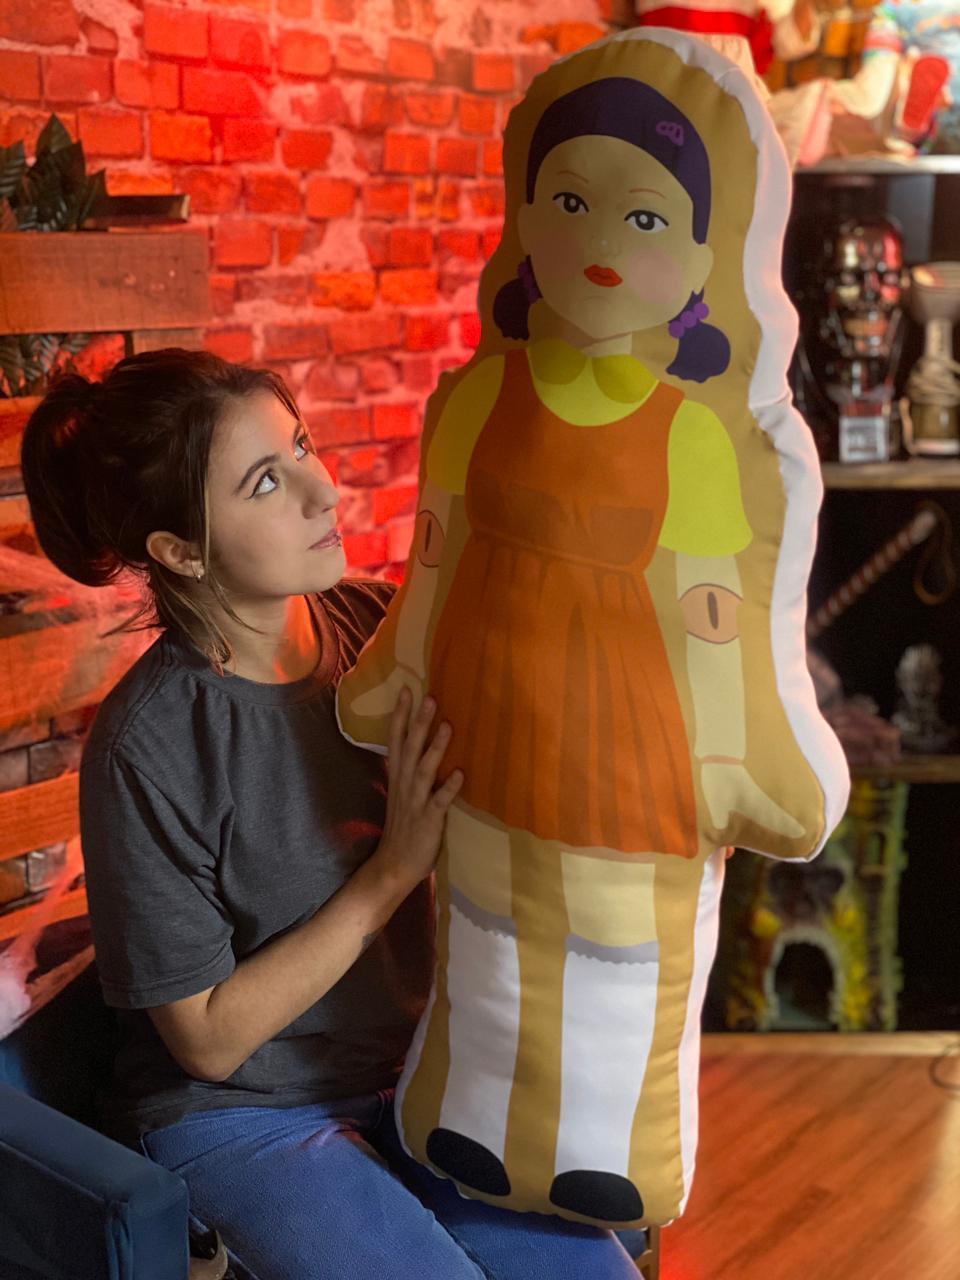 Almofada Busto 3D Boneca Batatinha Frita 1 2 3 Green Light Red Light Round 6 Squid Game Netflix - EV